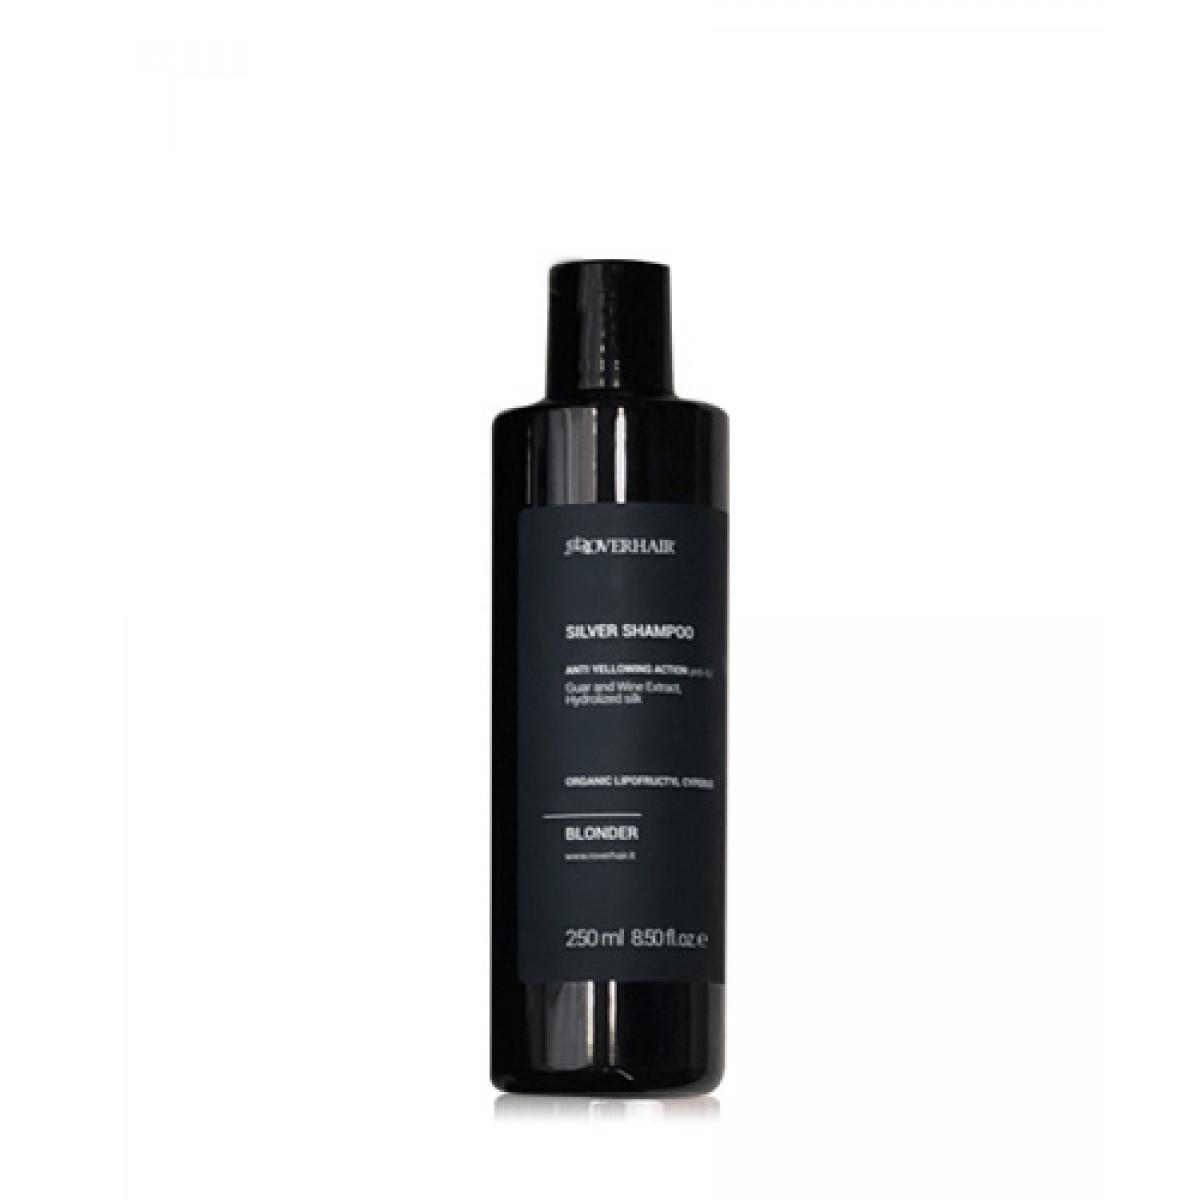 Roverhair Blonder Silver Shampoo Grijs/Blond Haar Image